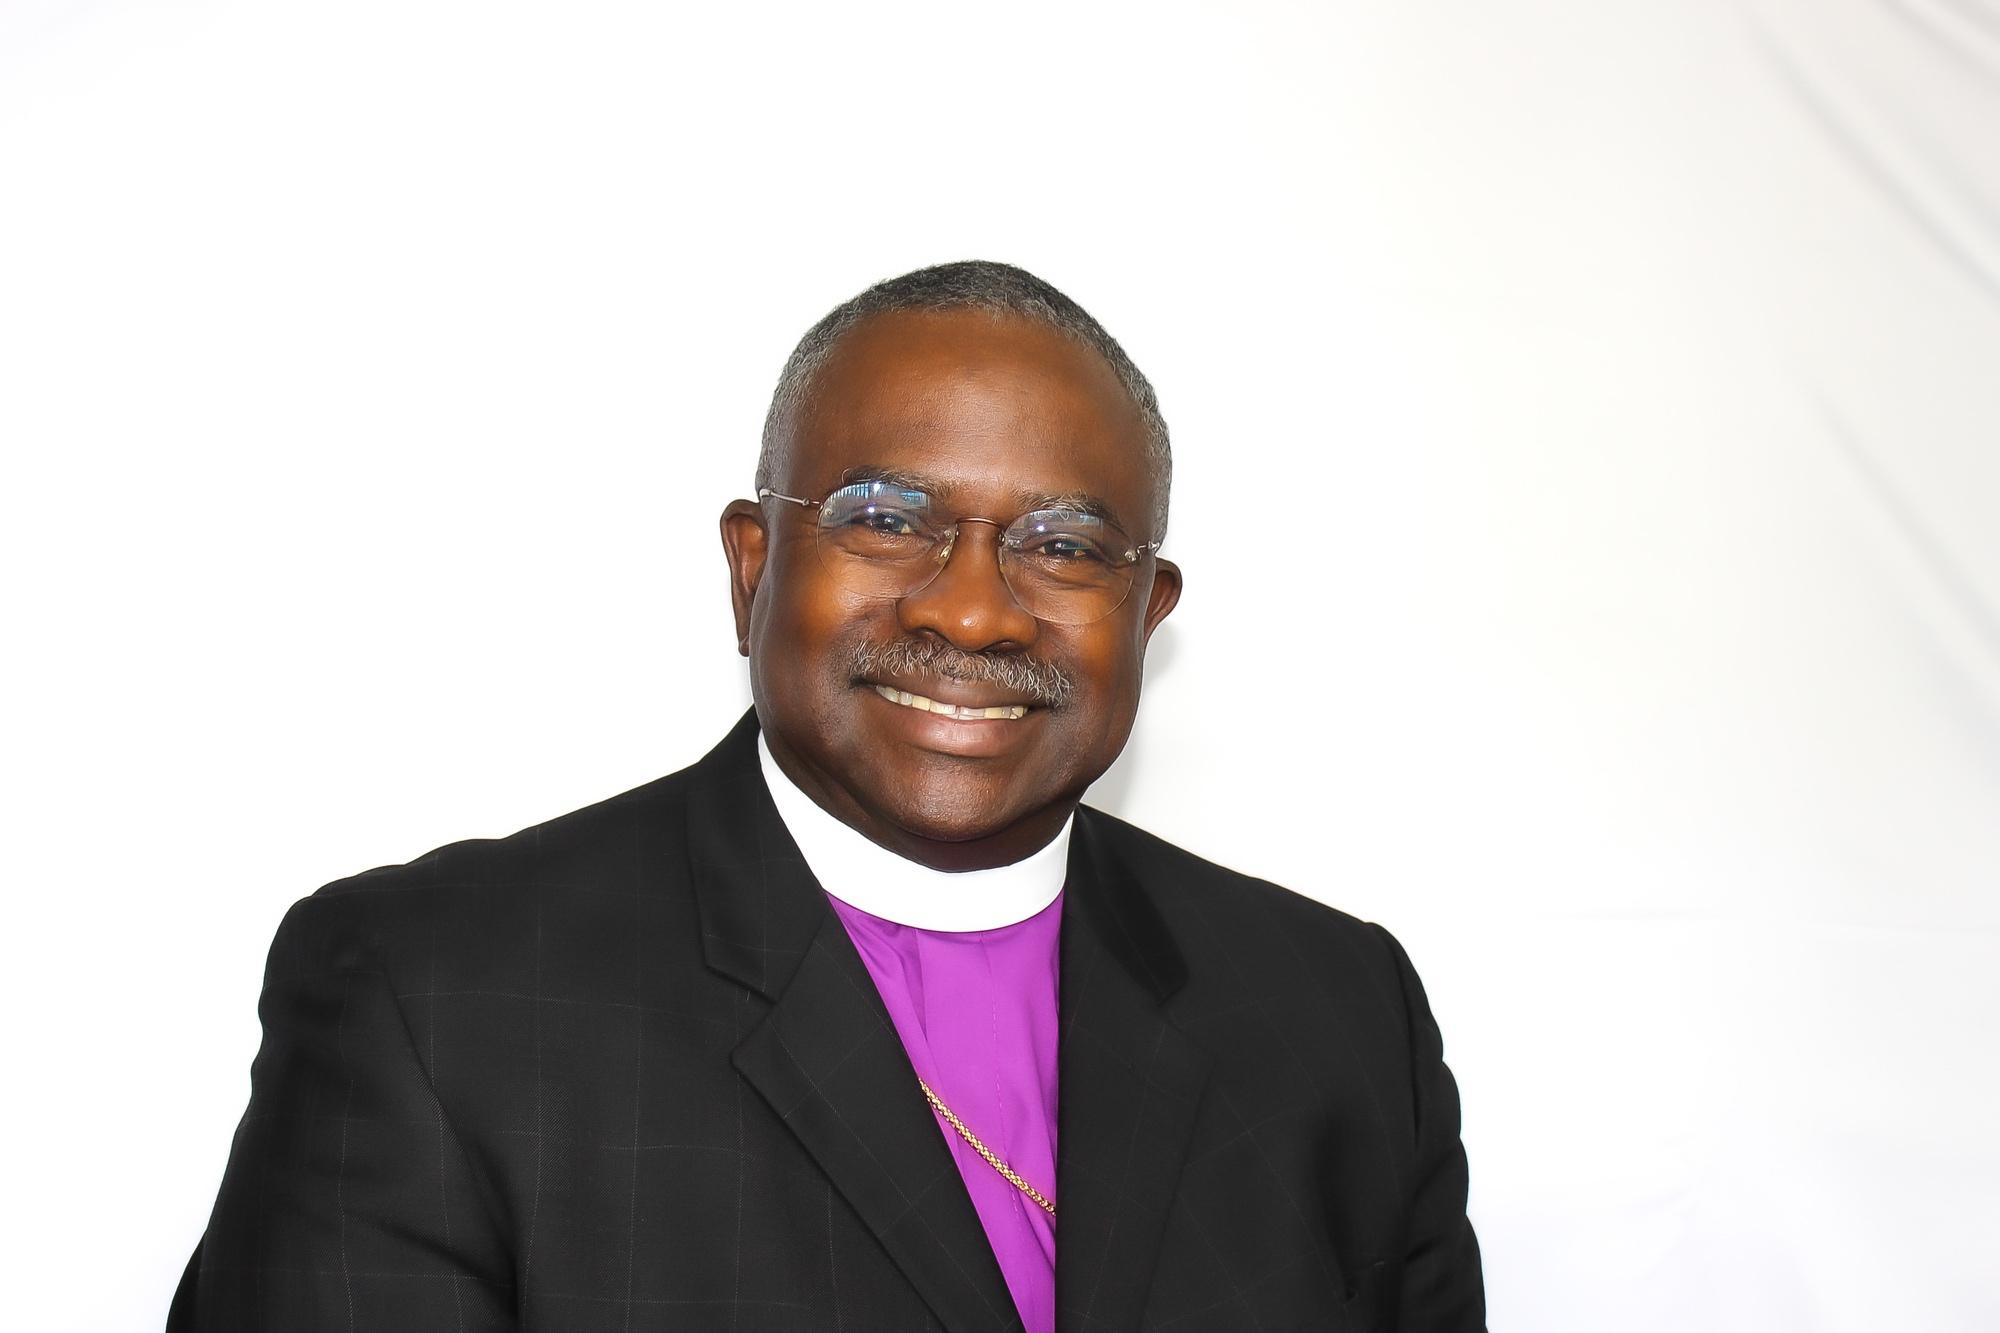 Pastor Jessie